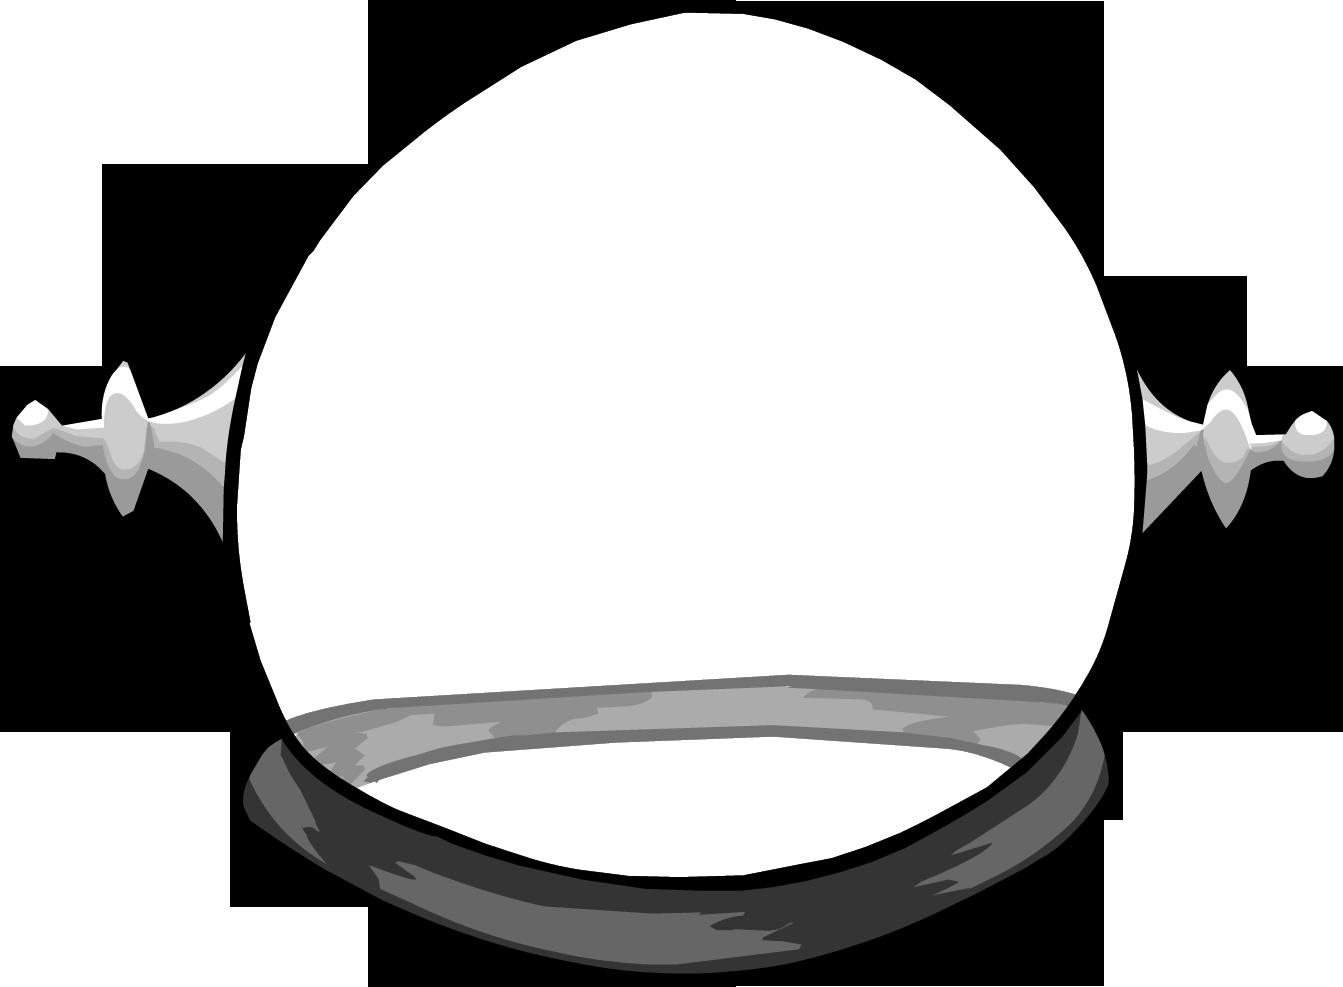 Astronaut clipart astronaut helmet Space Wikia Wiki by Helmet